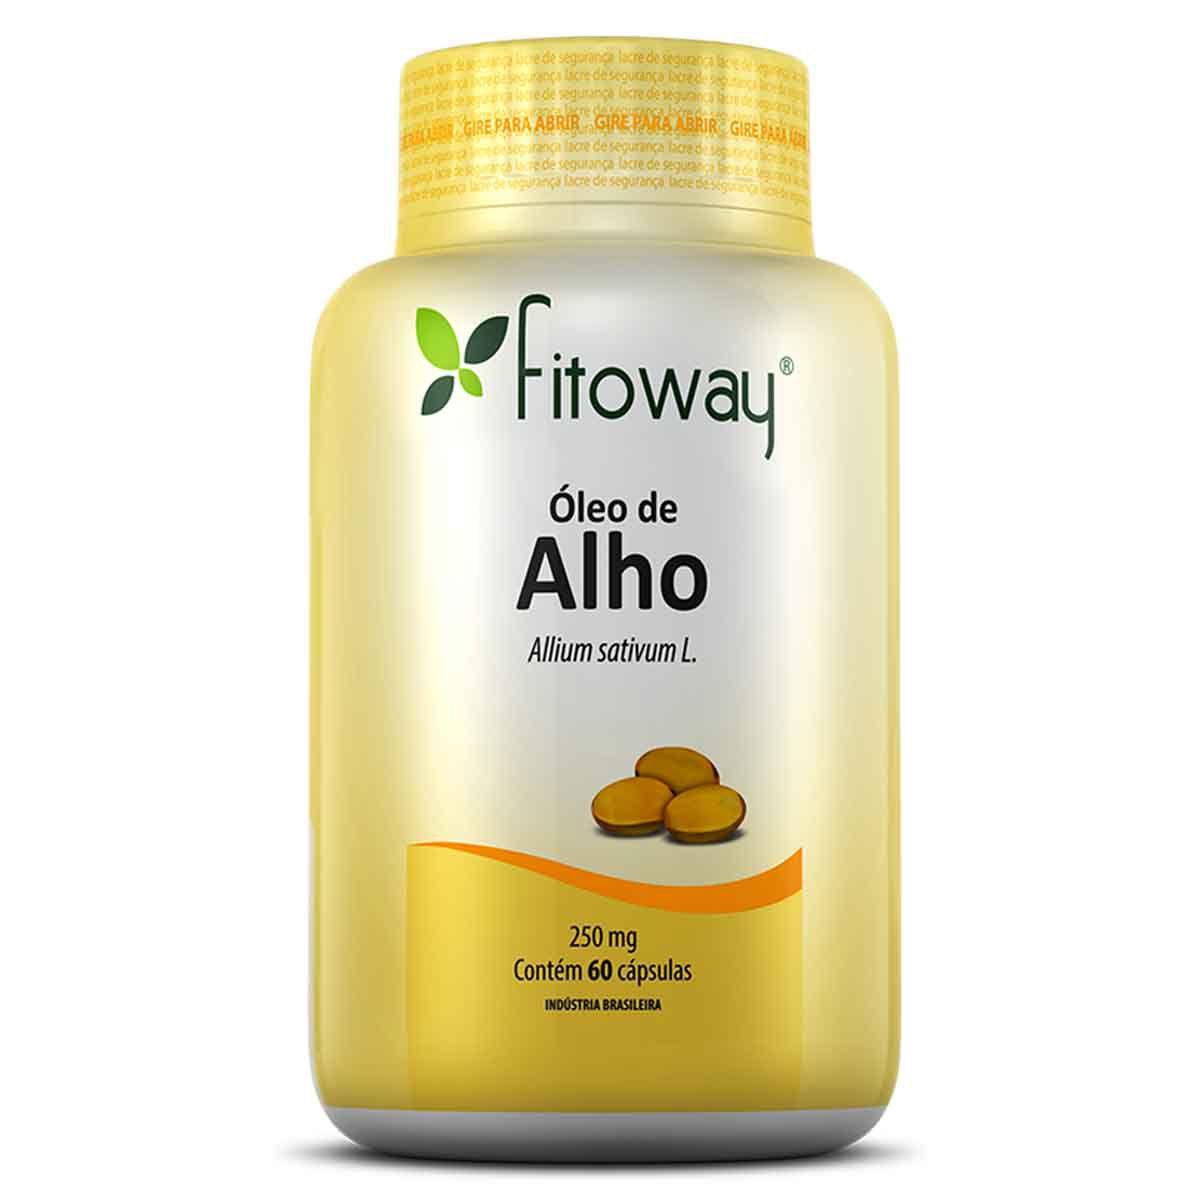 Óleo de Alho 250mg 60 cápsulas - Fitoway